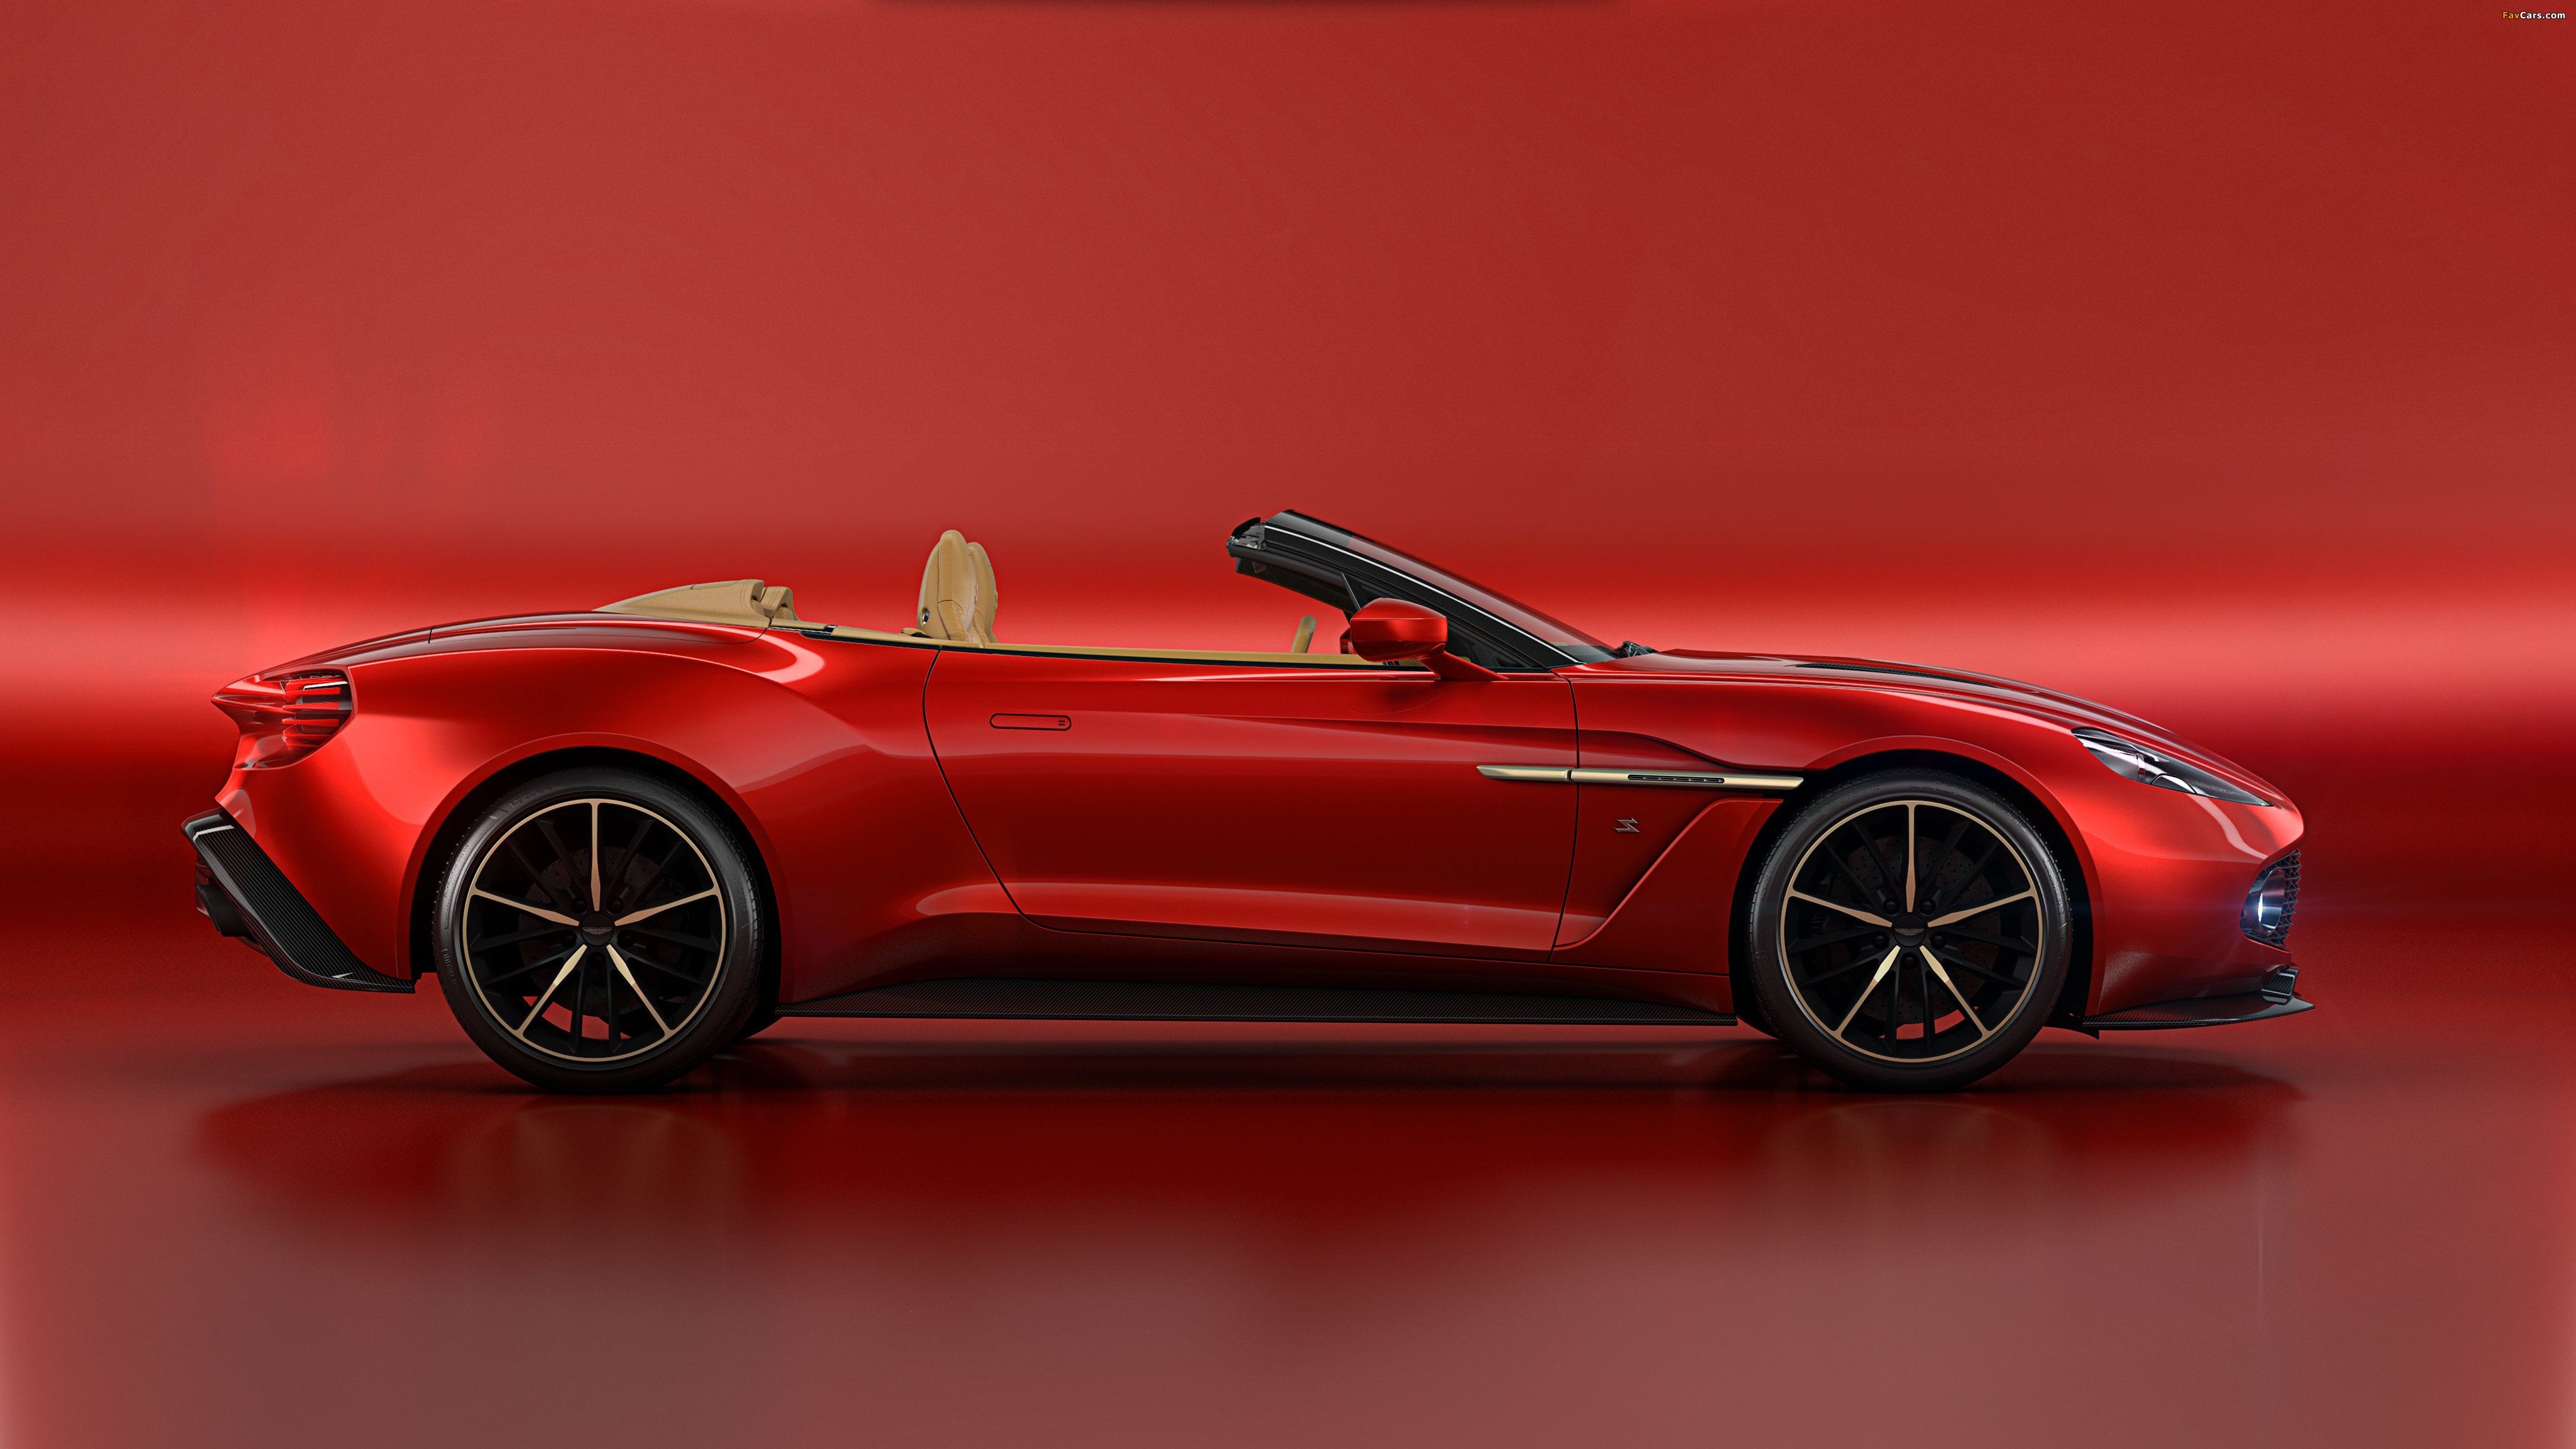 Aston Martin Vanquish Zagato Volante 2016 images (4096 x 2304)